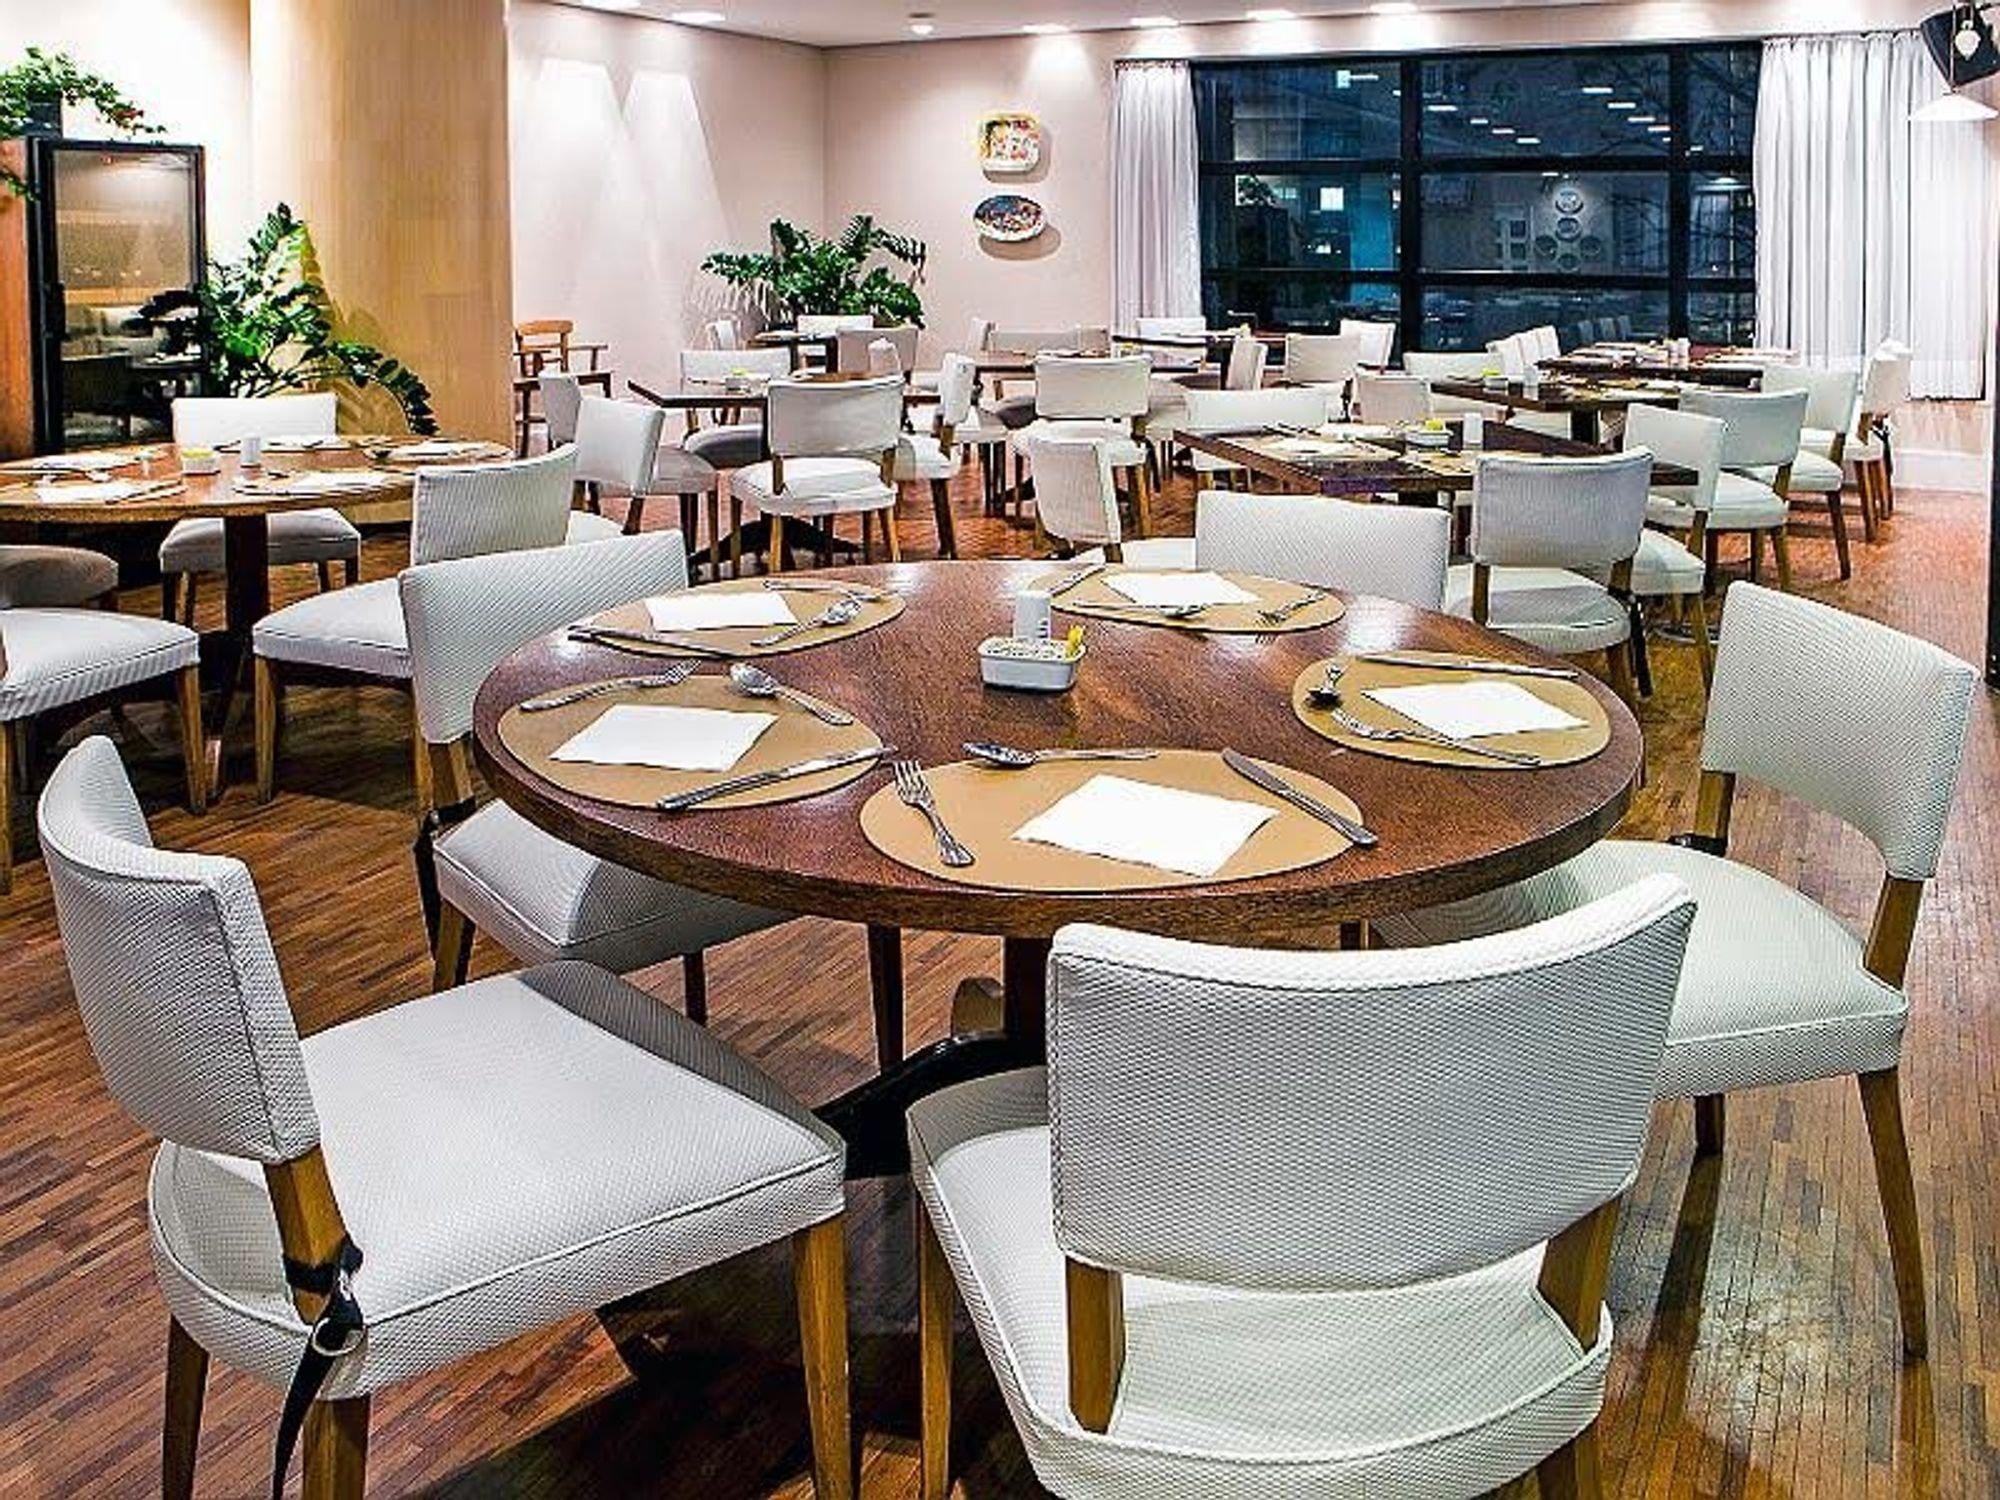 Foto de Sala com vaso de planta, garfo, faca, cadeira, mesa de jantar